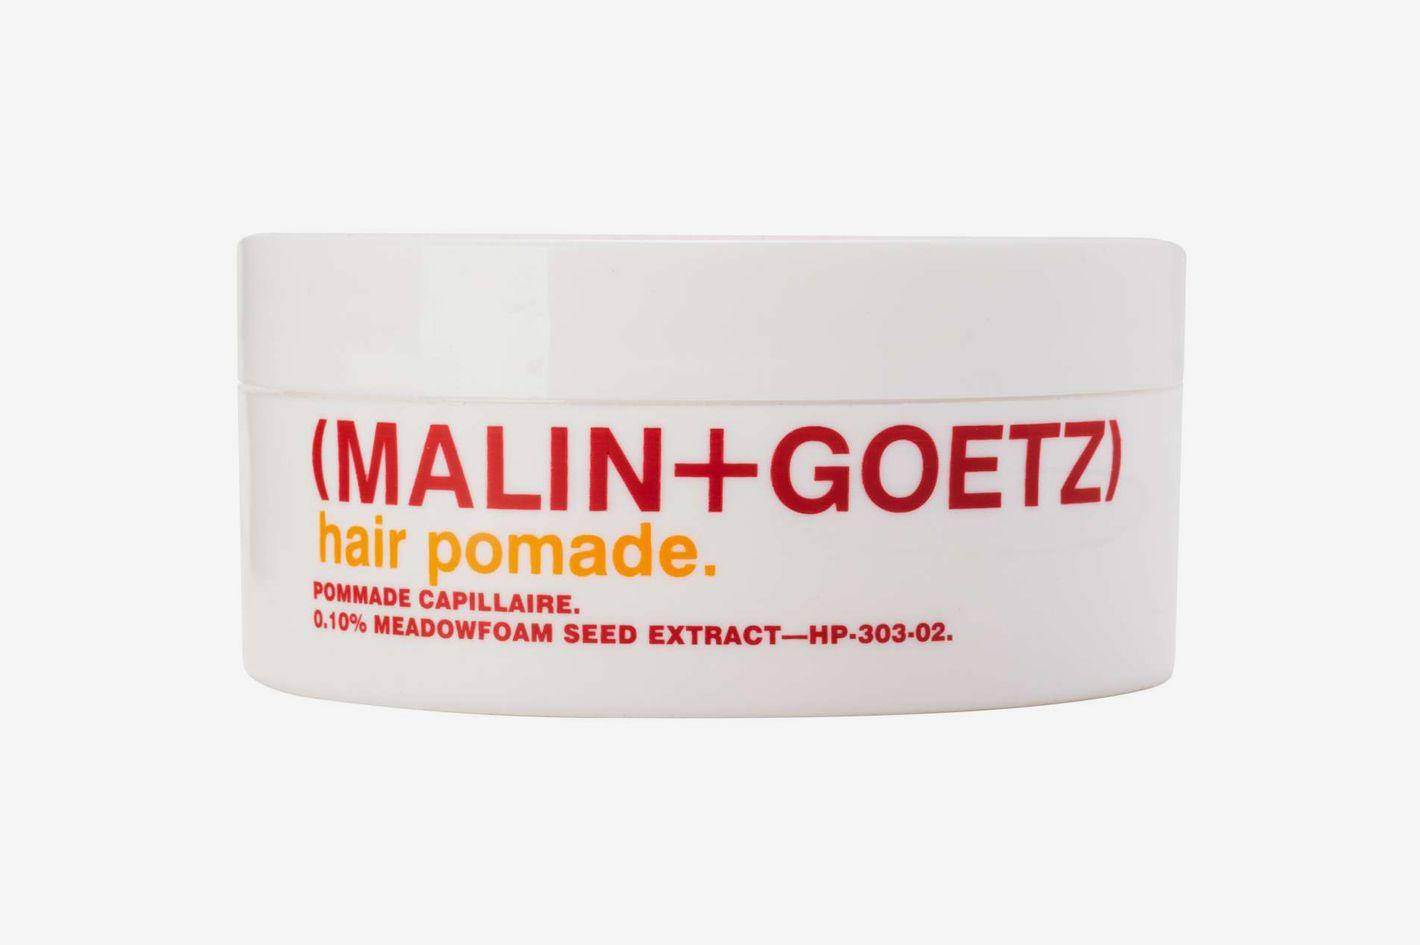 (Malin + Goetz) Hair Pomade